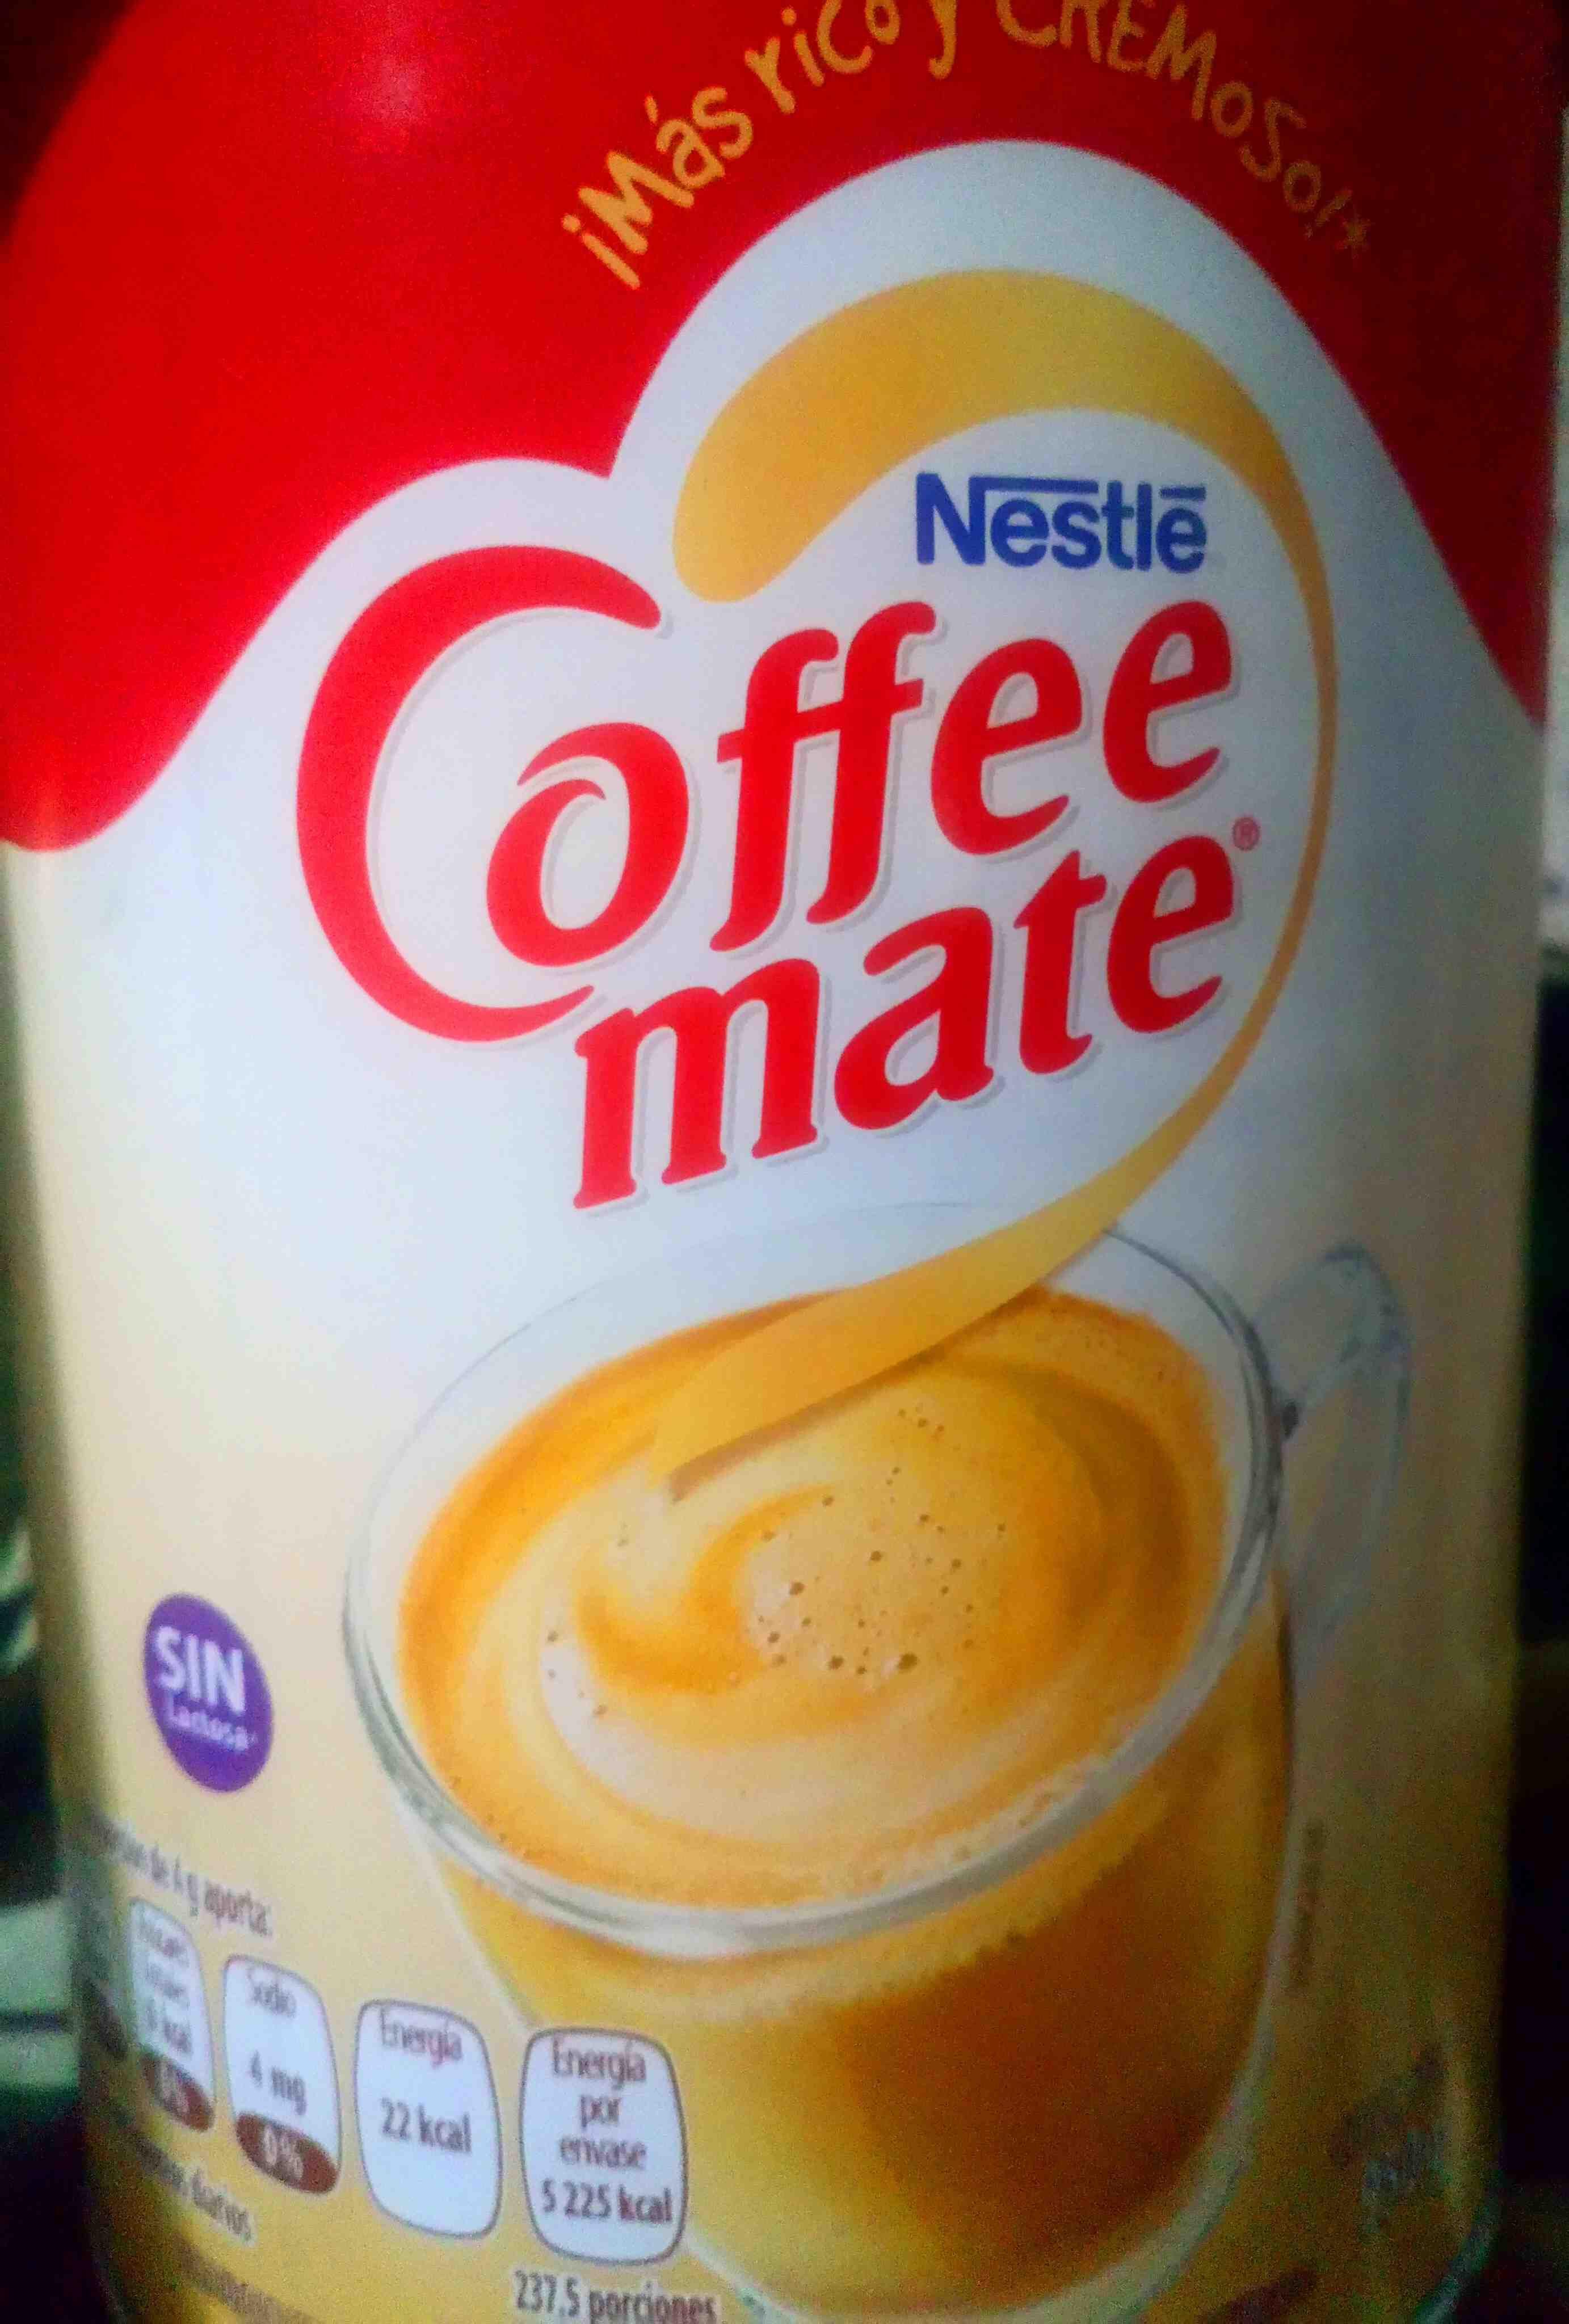 Coffee mate. Coffee mate. - Product